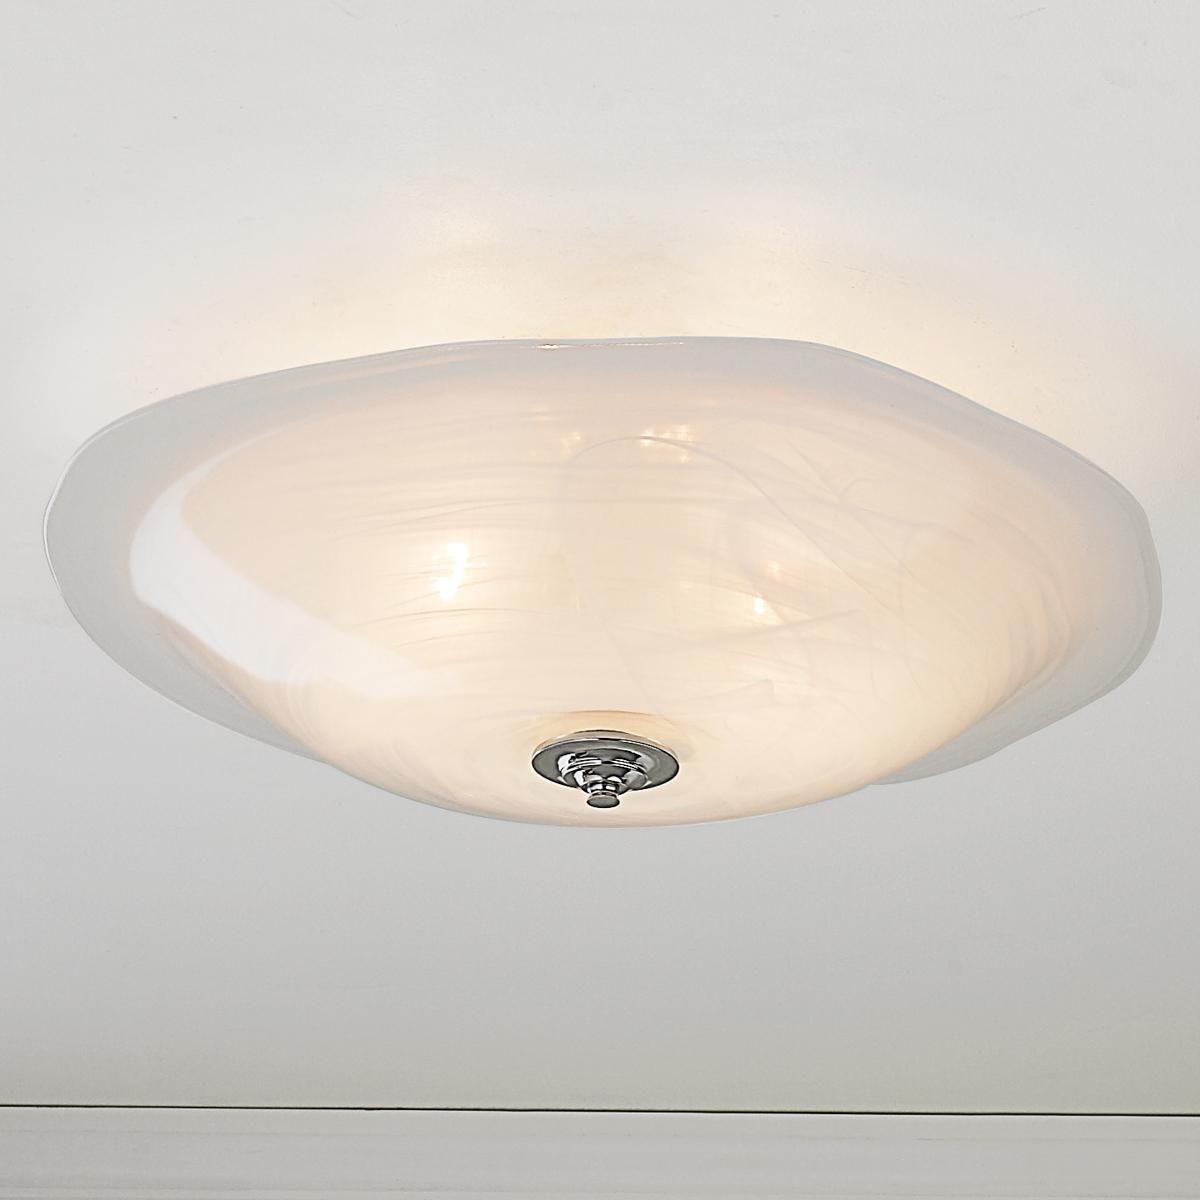 Large Cloud Art Glass Ceiling Light Like Sunlight Filtering